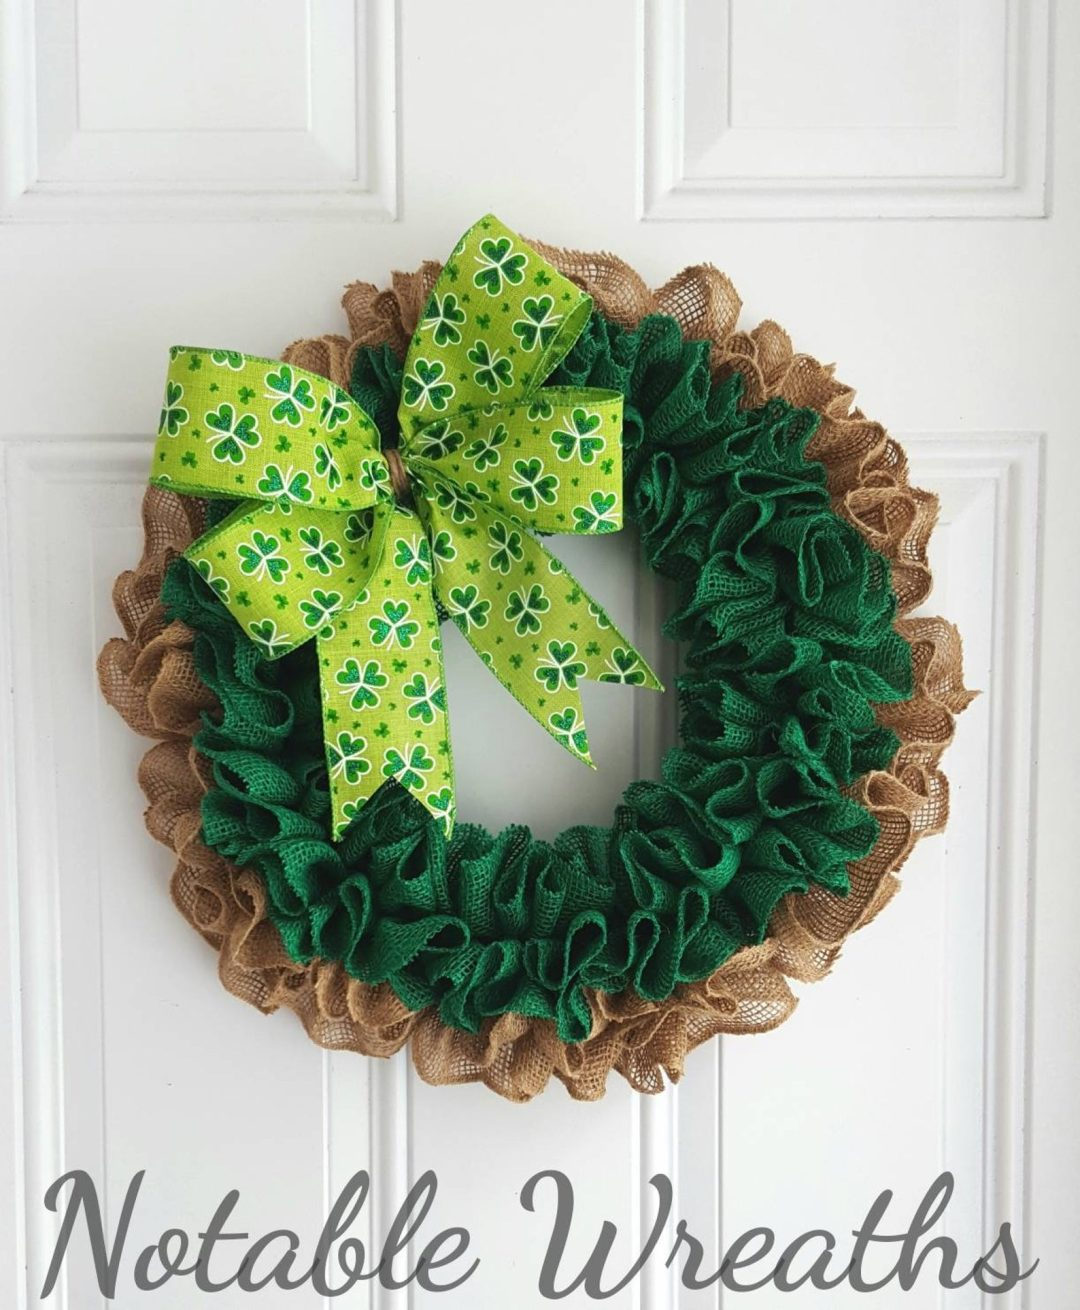 St. Patrick's Day decor ideas - St. Patrick's Day wreaths